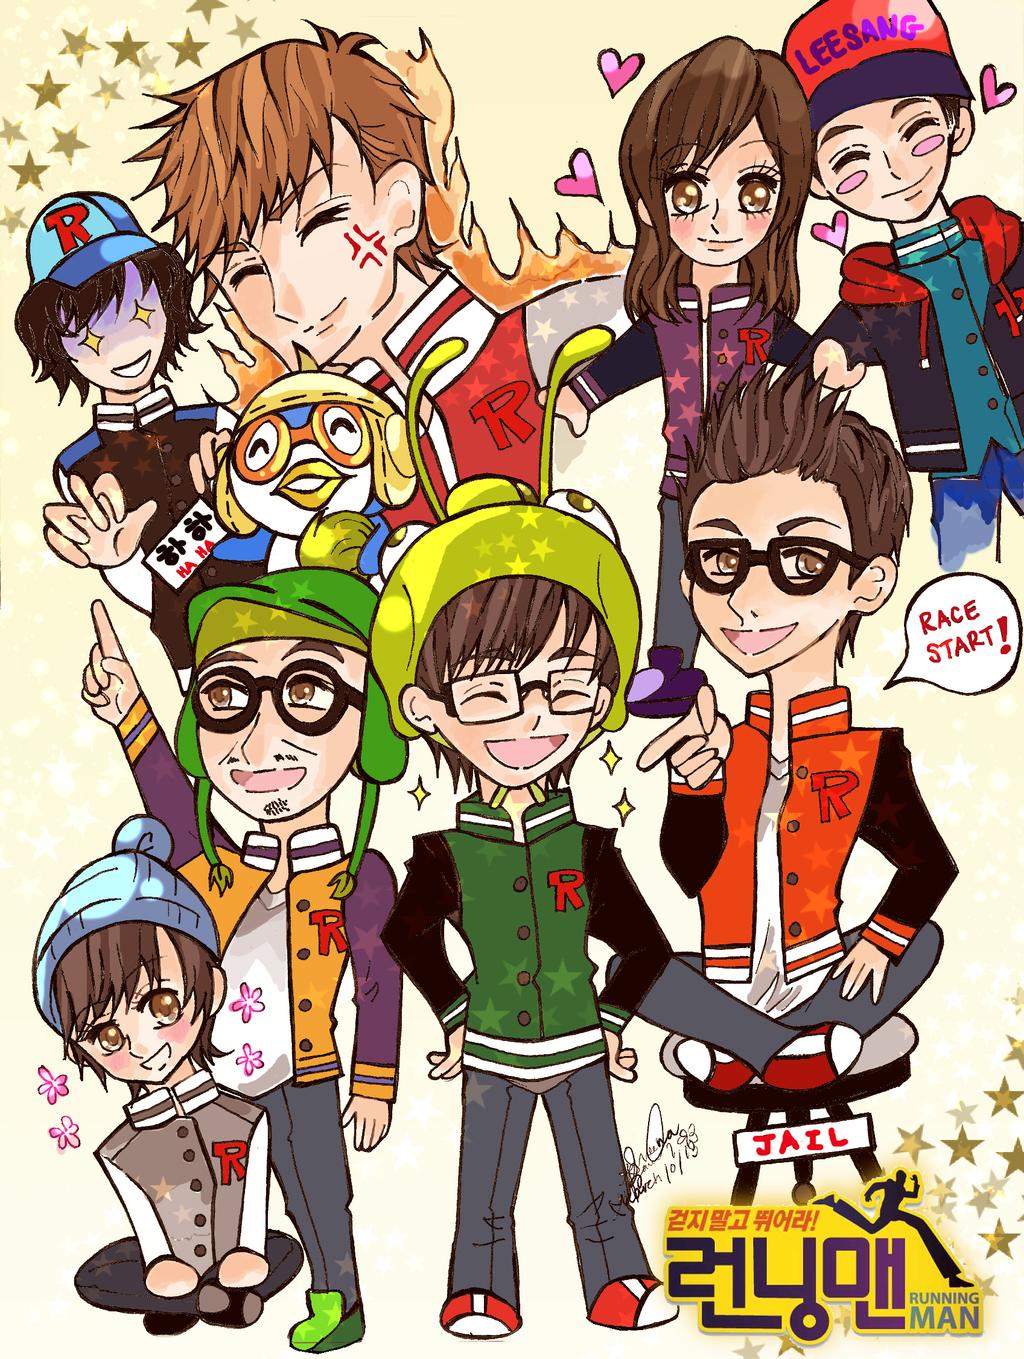 running anime wallpaper - photo #34